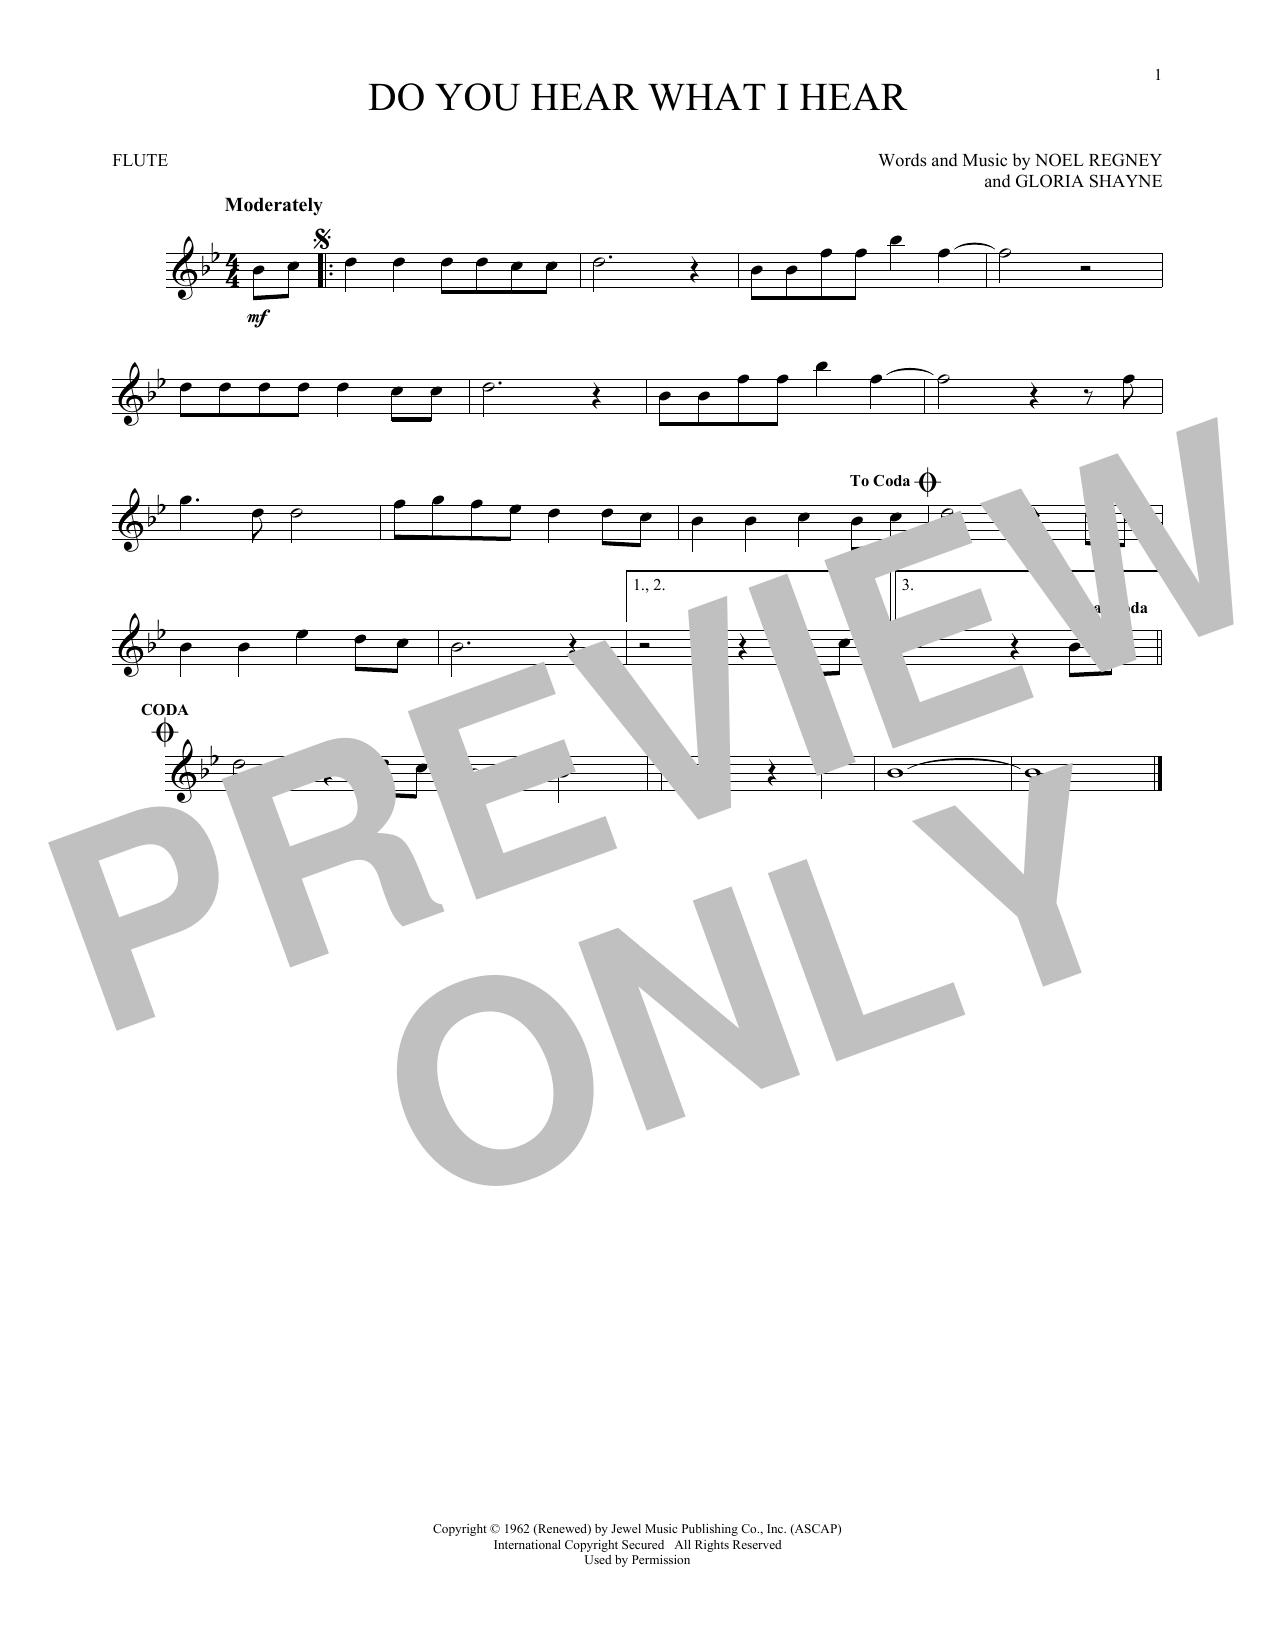 Partition flûte Do You Hear What I Hear de Noel Regney & Gloria Shayne - Flute traversiere